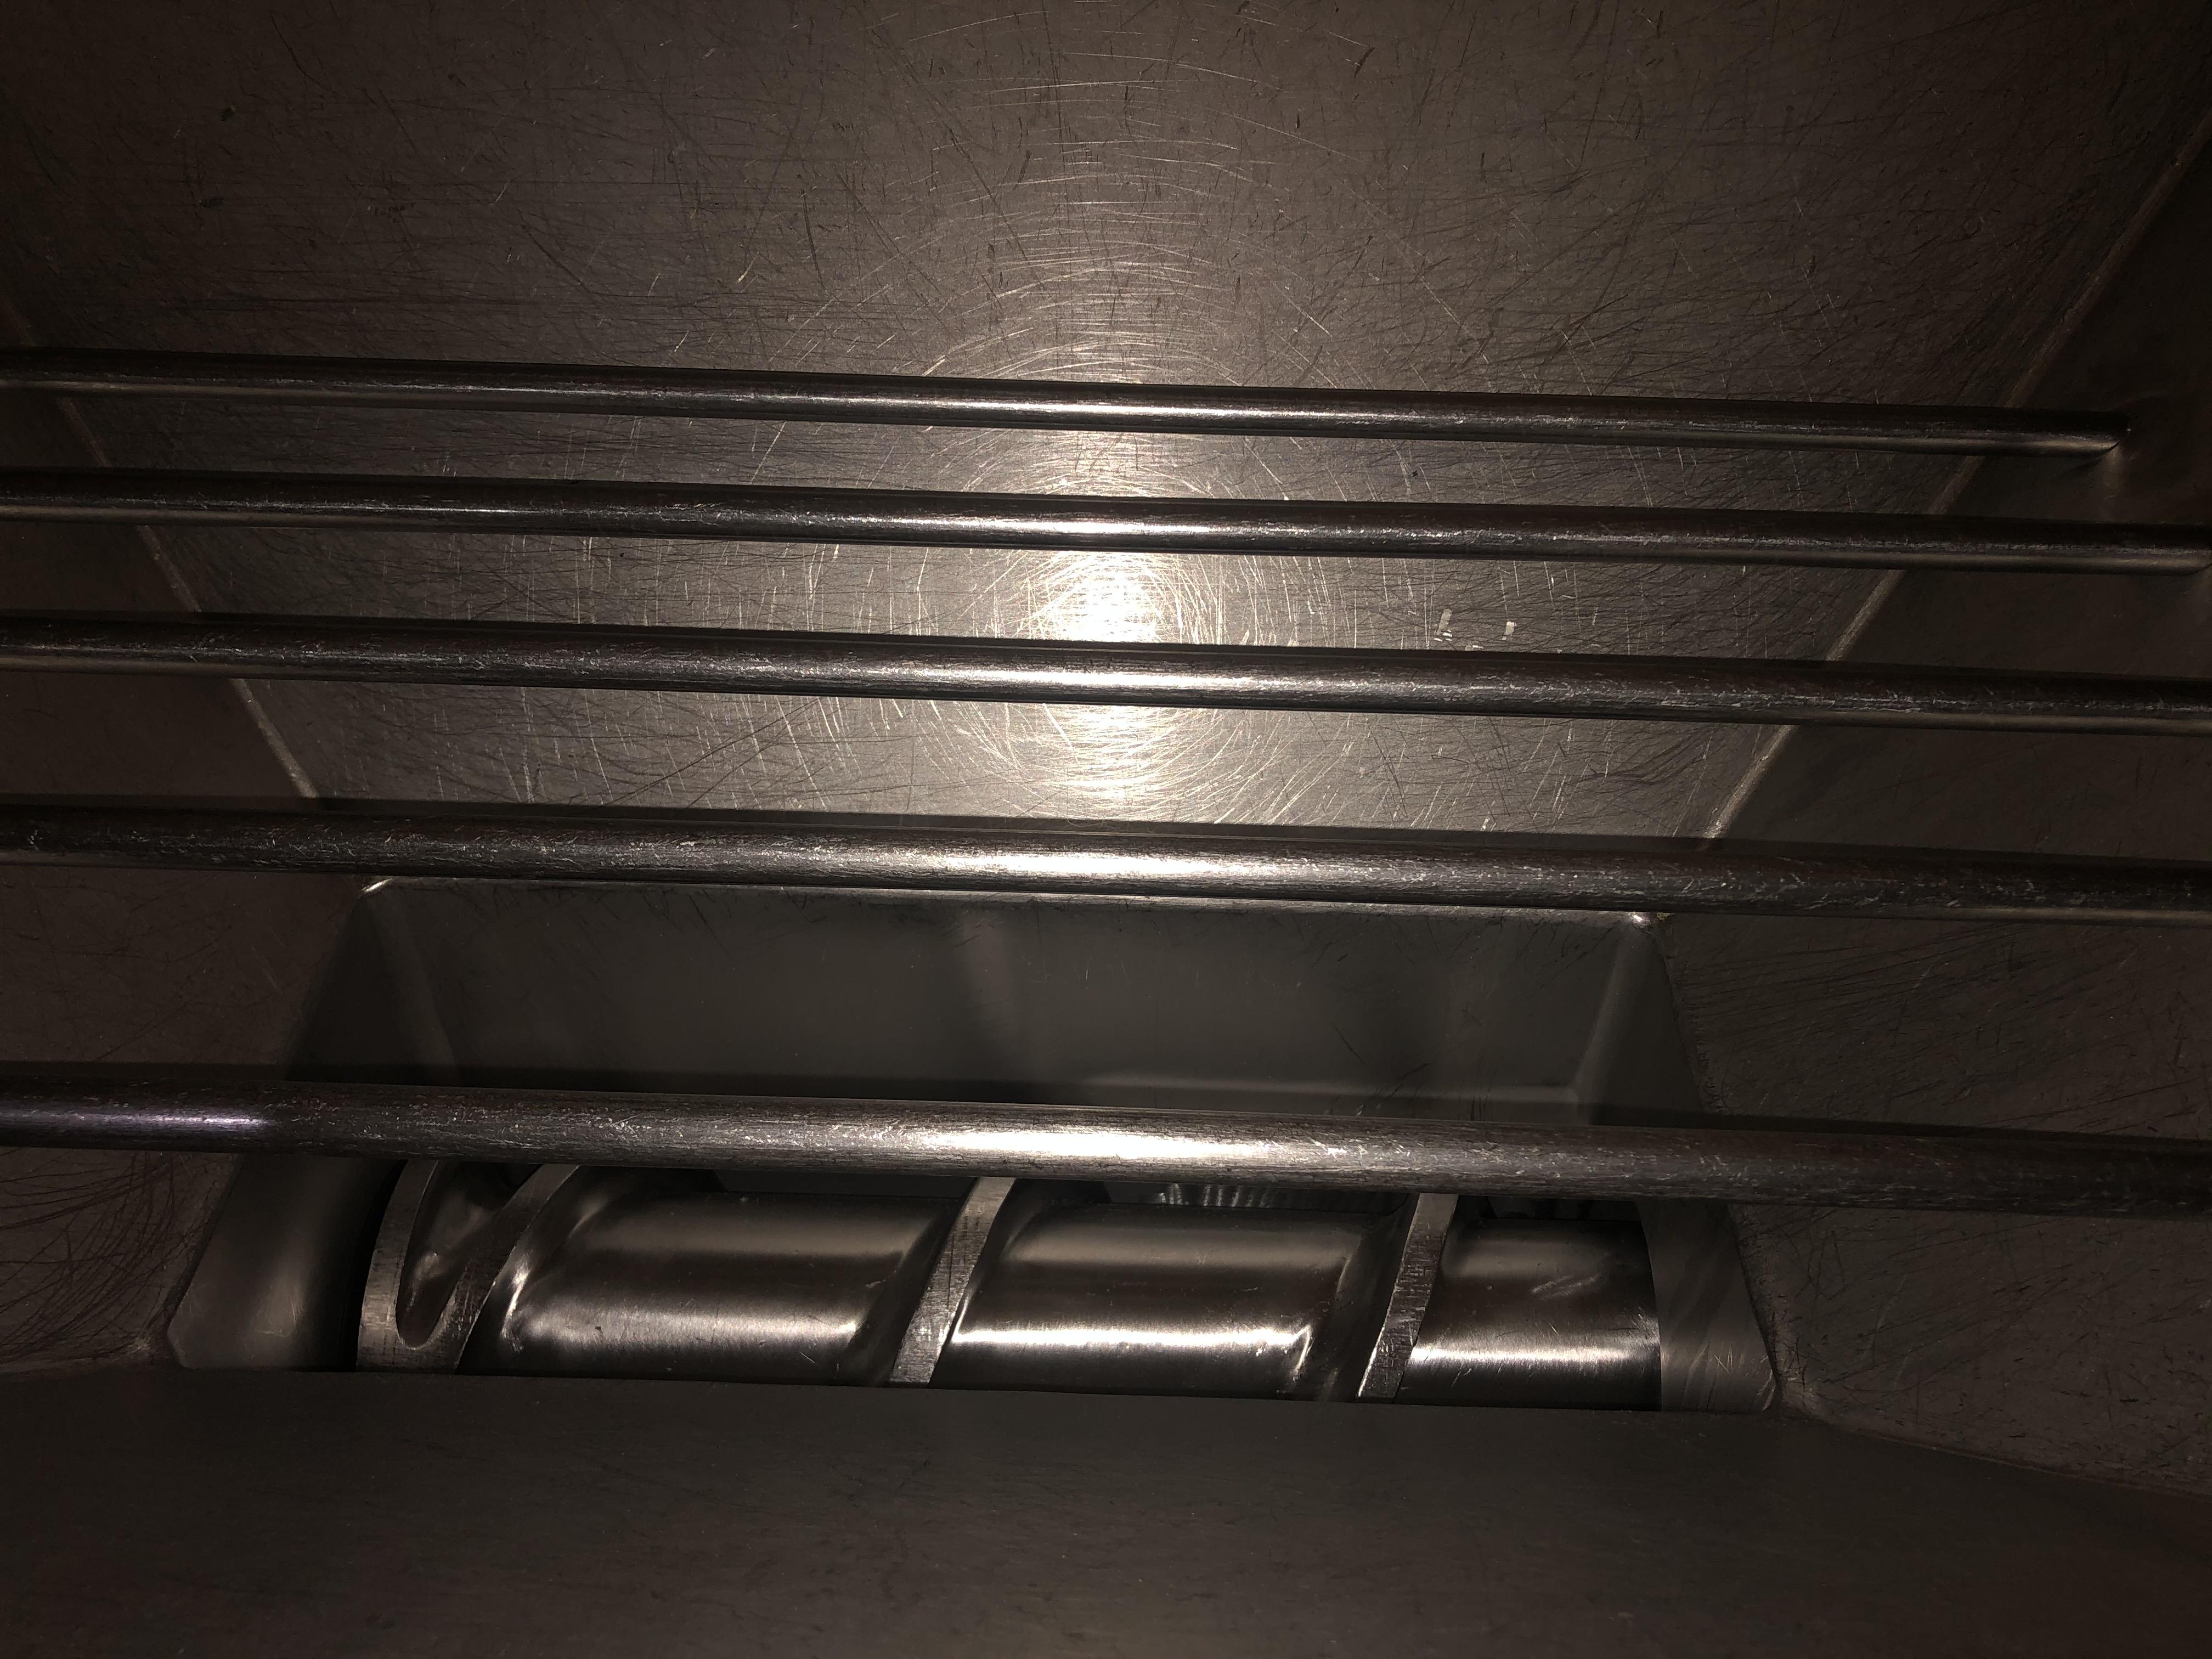 Lot 55A - Mepaco Grinder Model 7-7 S/N M12381-1 (Rigging Fee - $200)